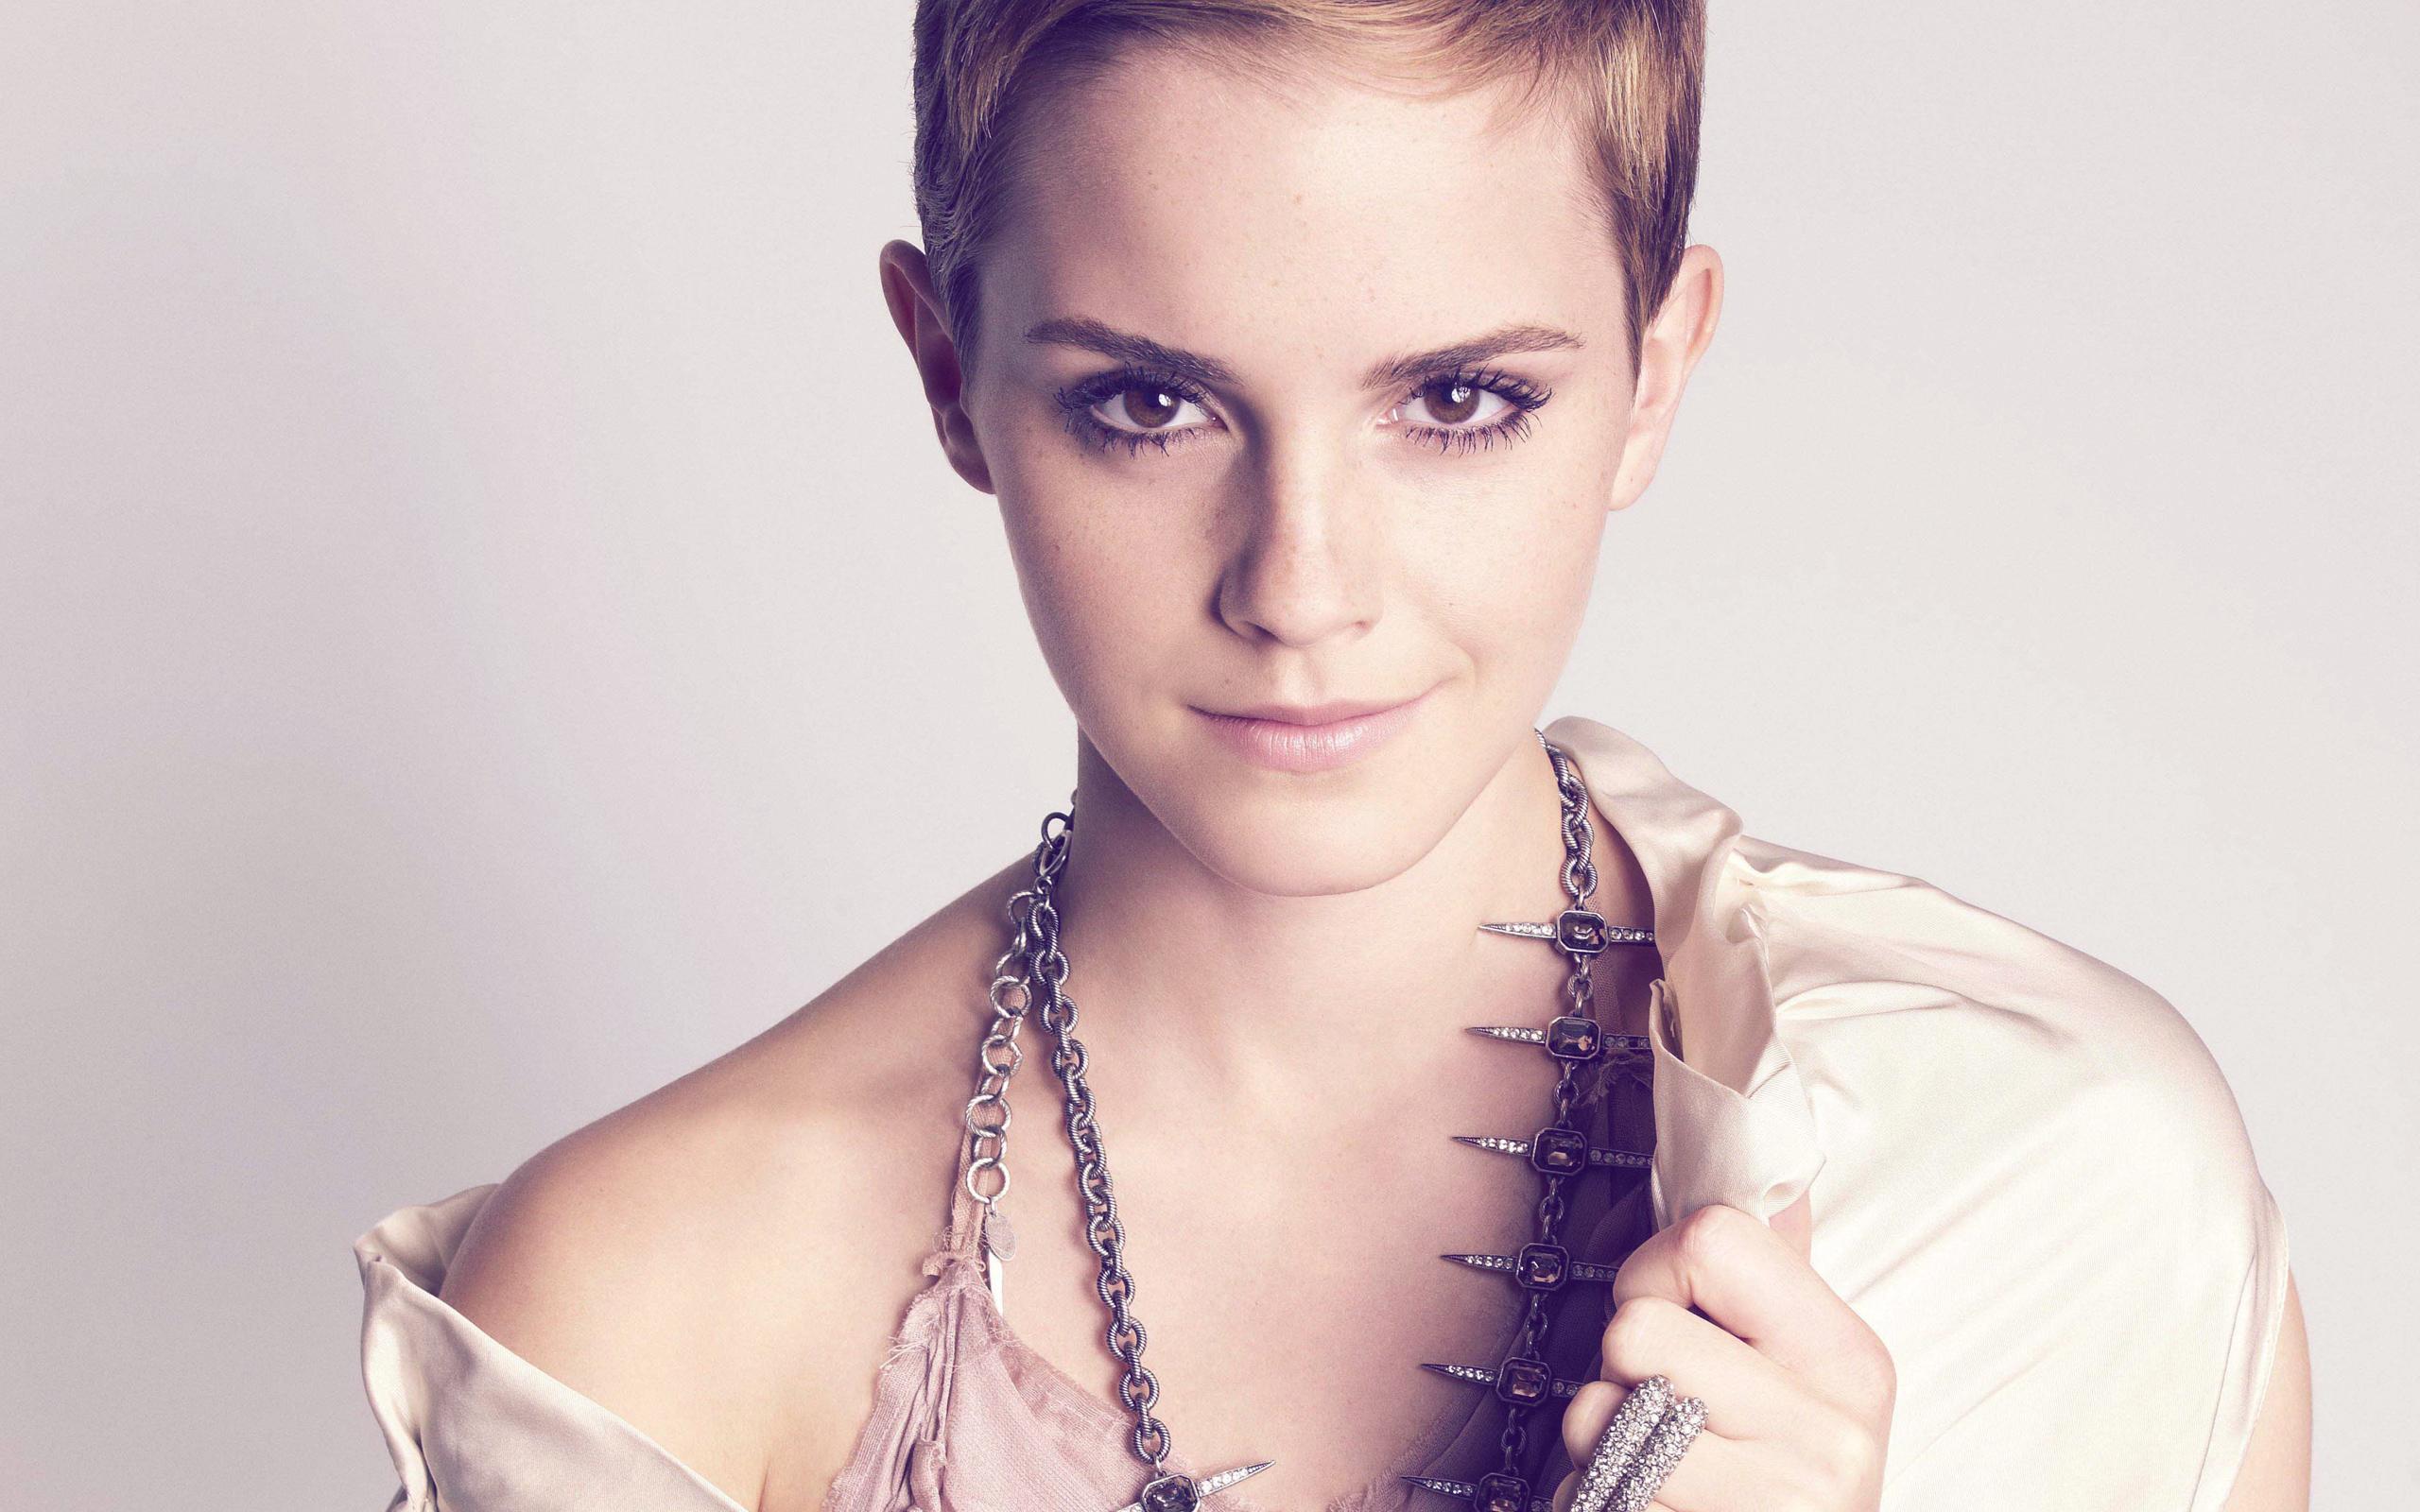 Emma Watson 2012 Wallpapers HD Wallpapers 2560x1600